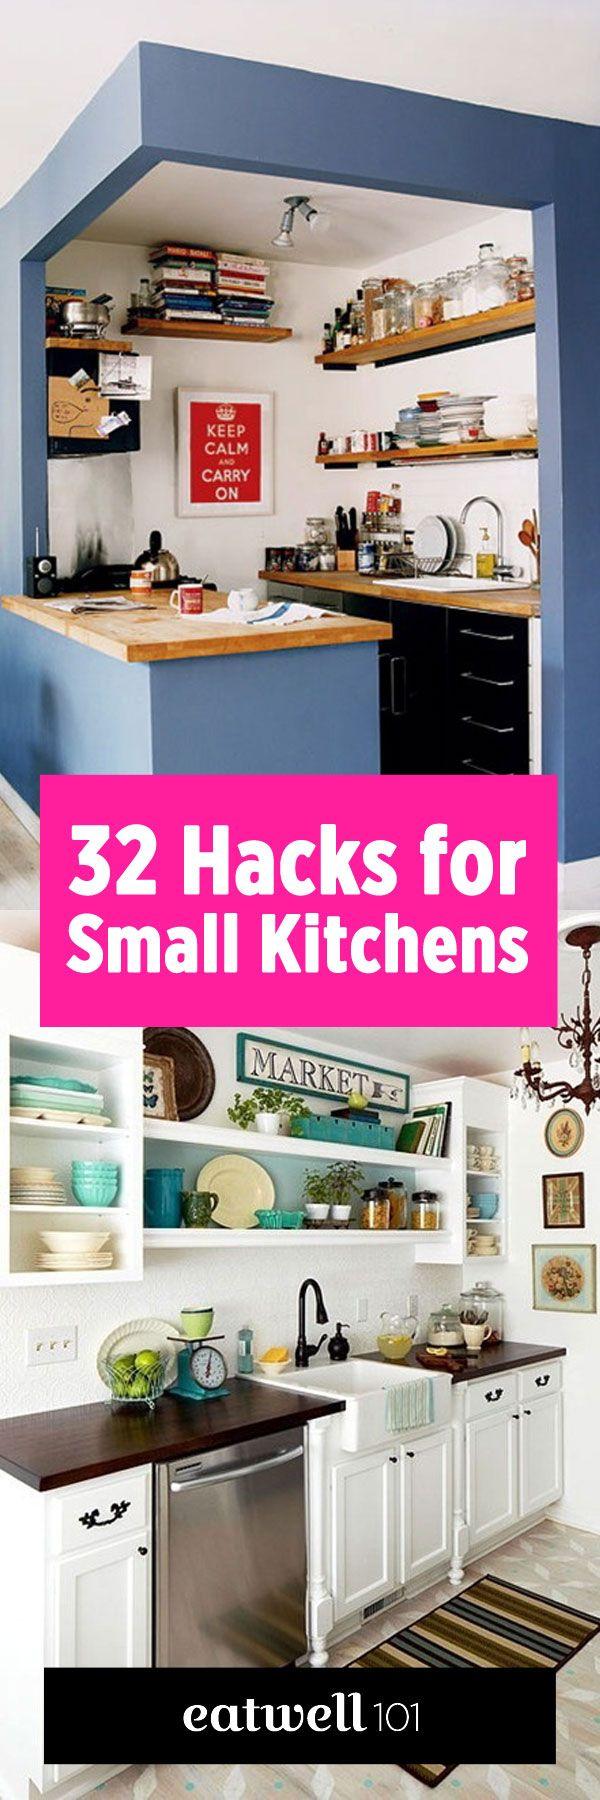 32 Brilliant Hacks To Make A Small Kitchen Look Bigger Part 43